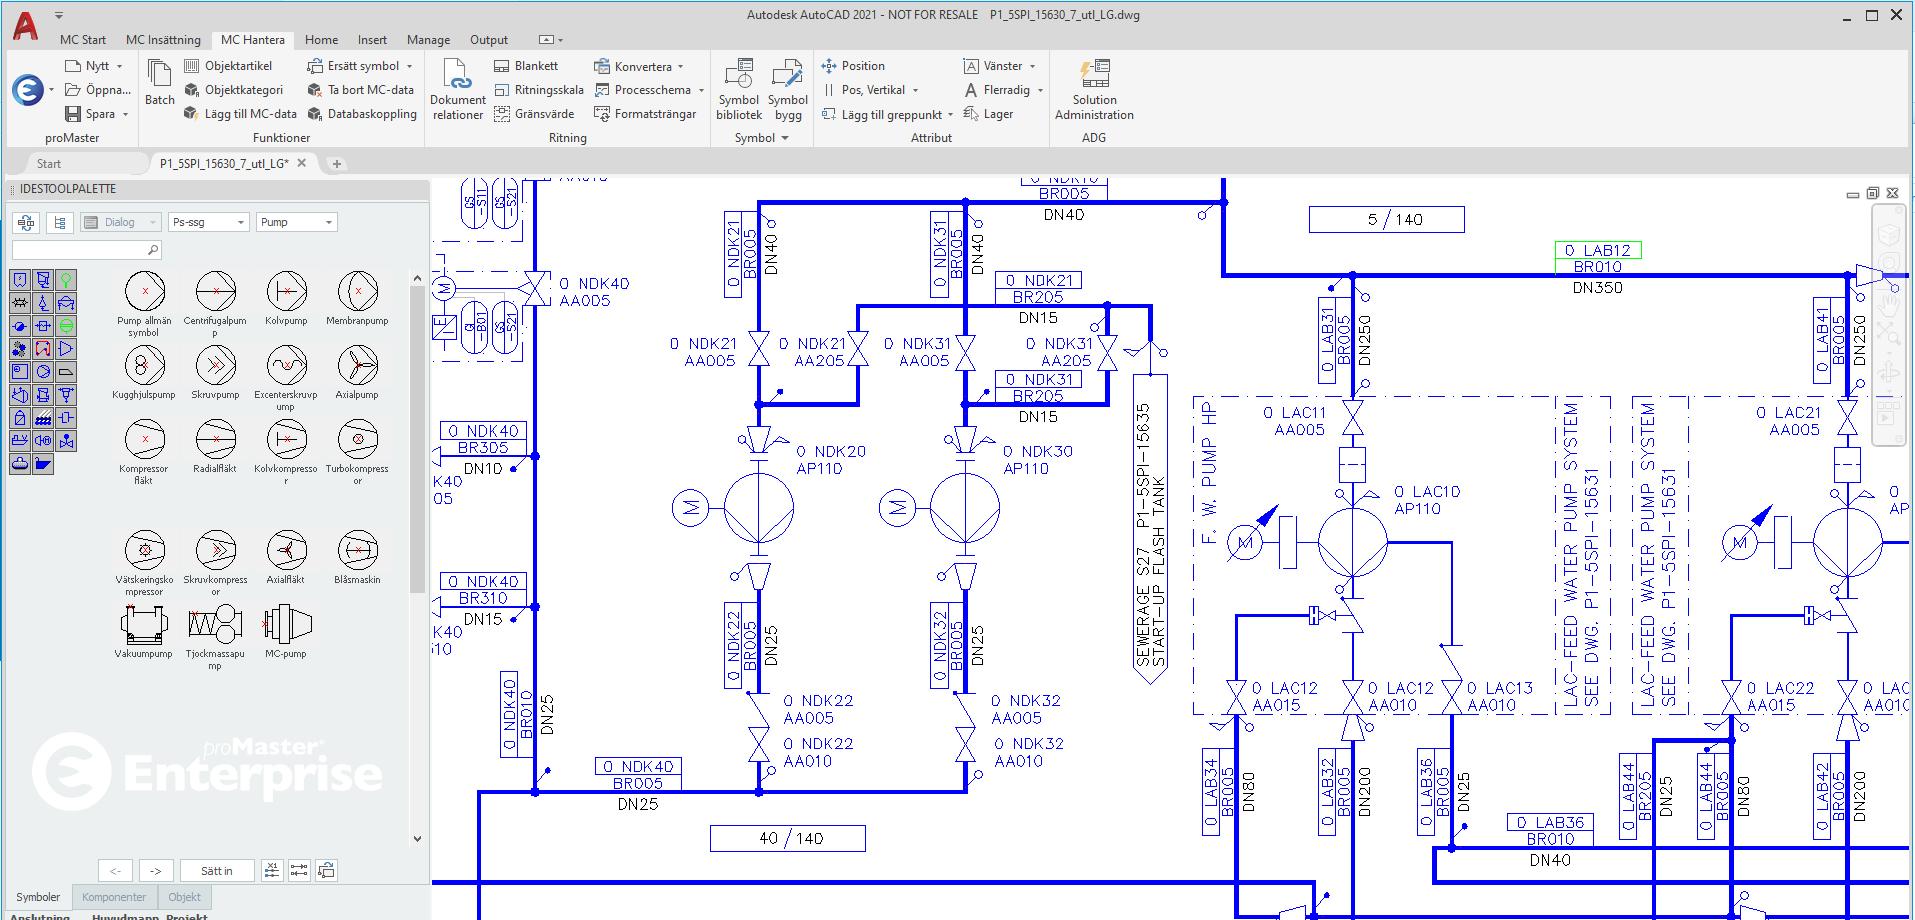 proMaster design enterprise 2021